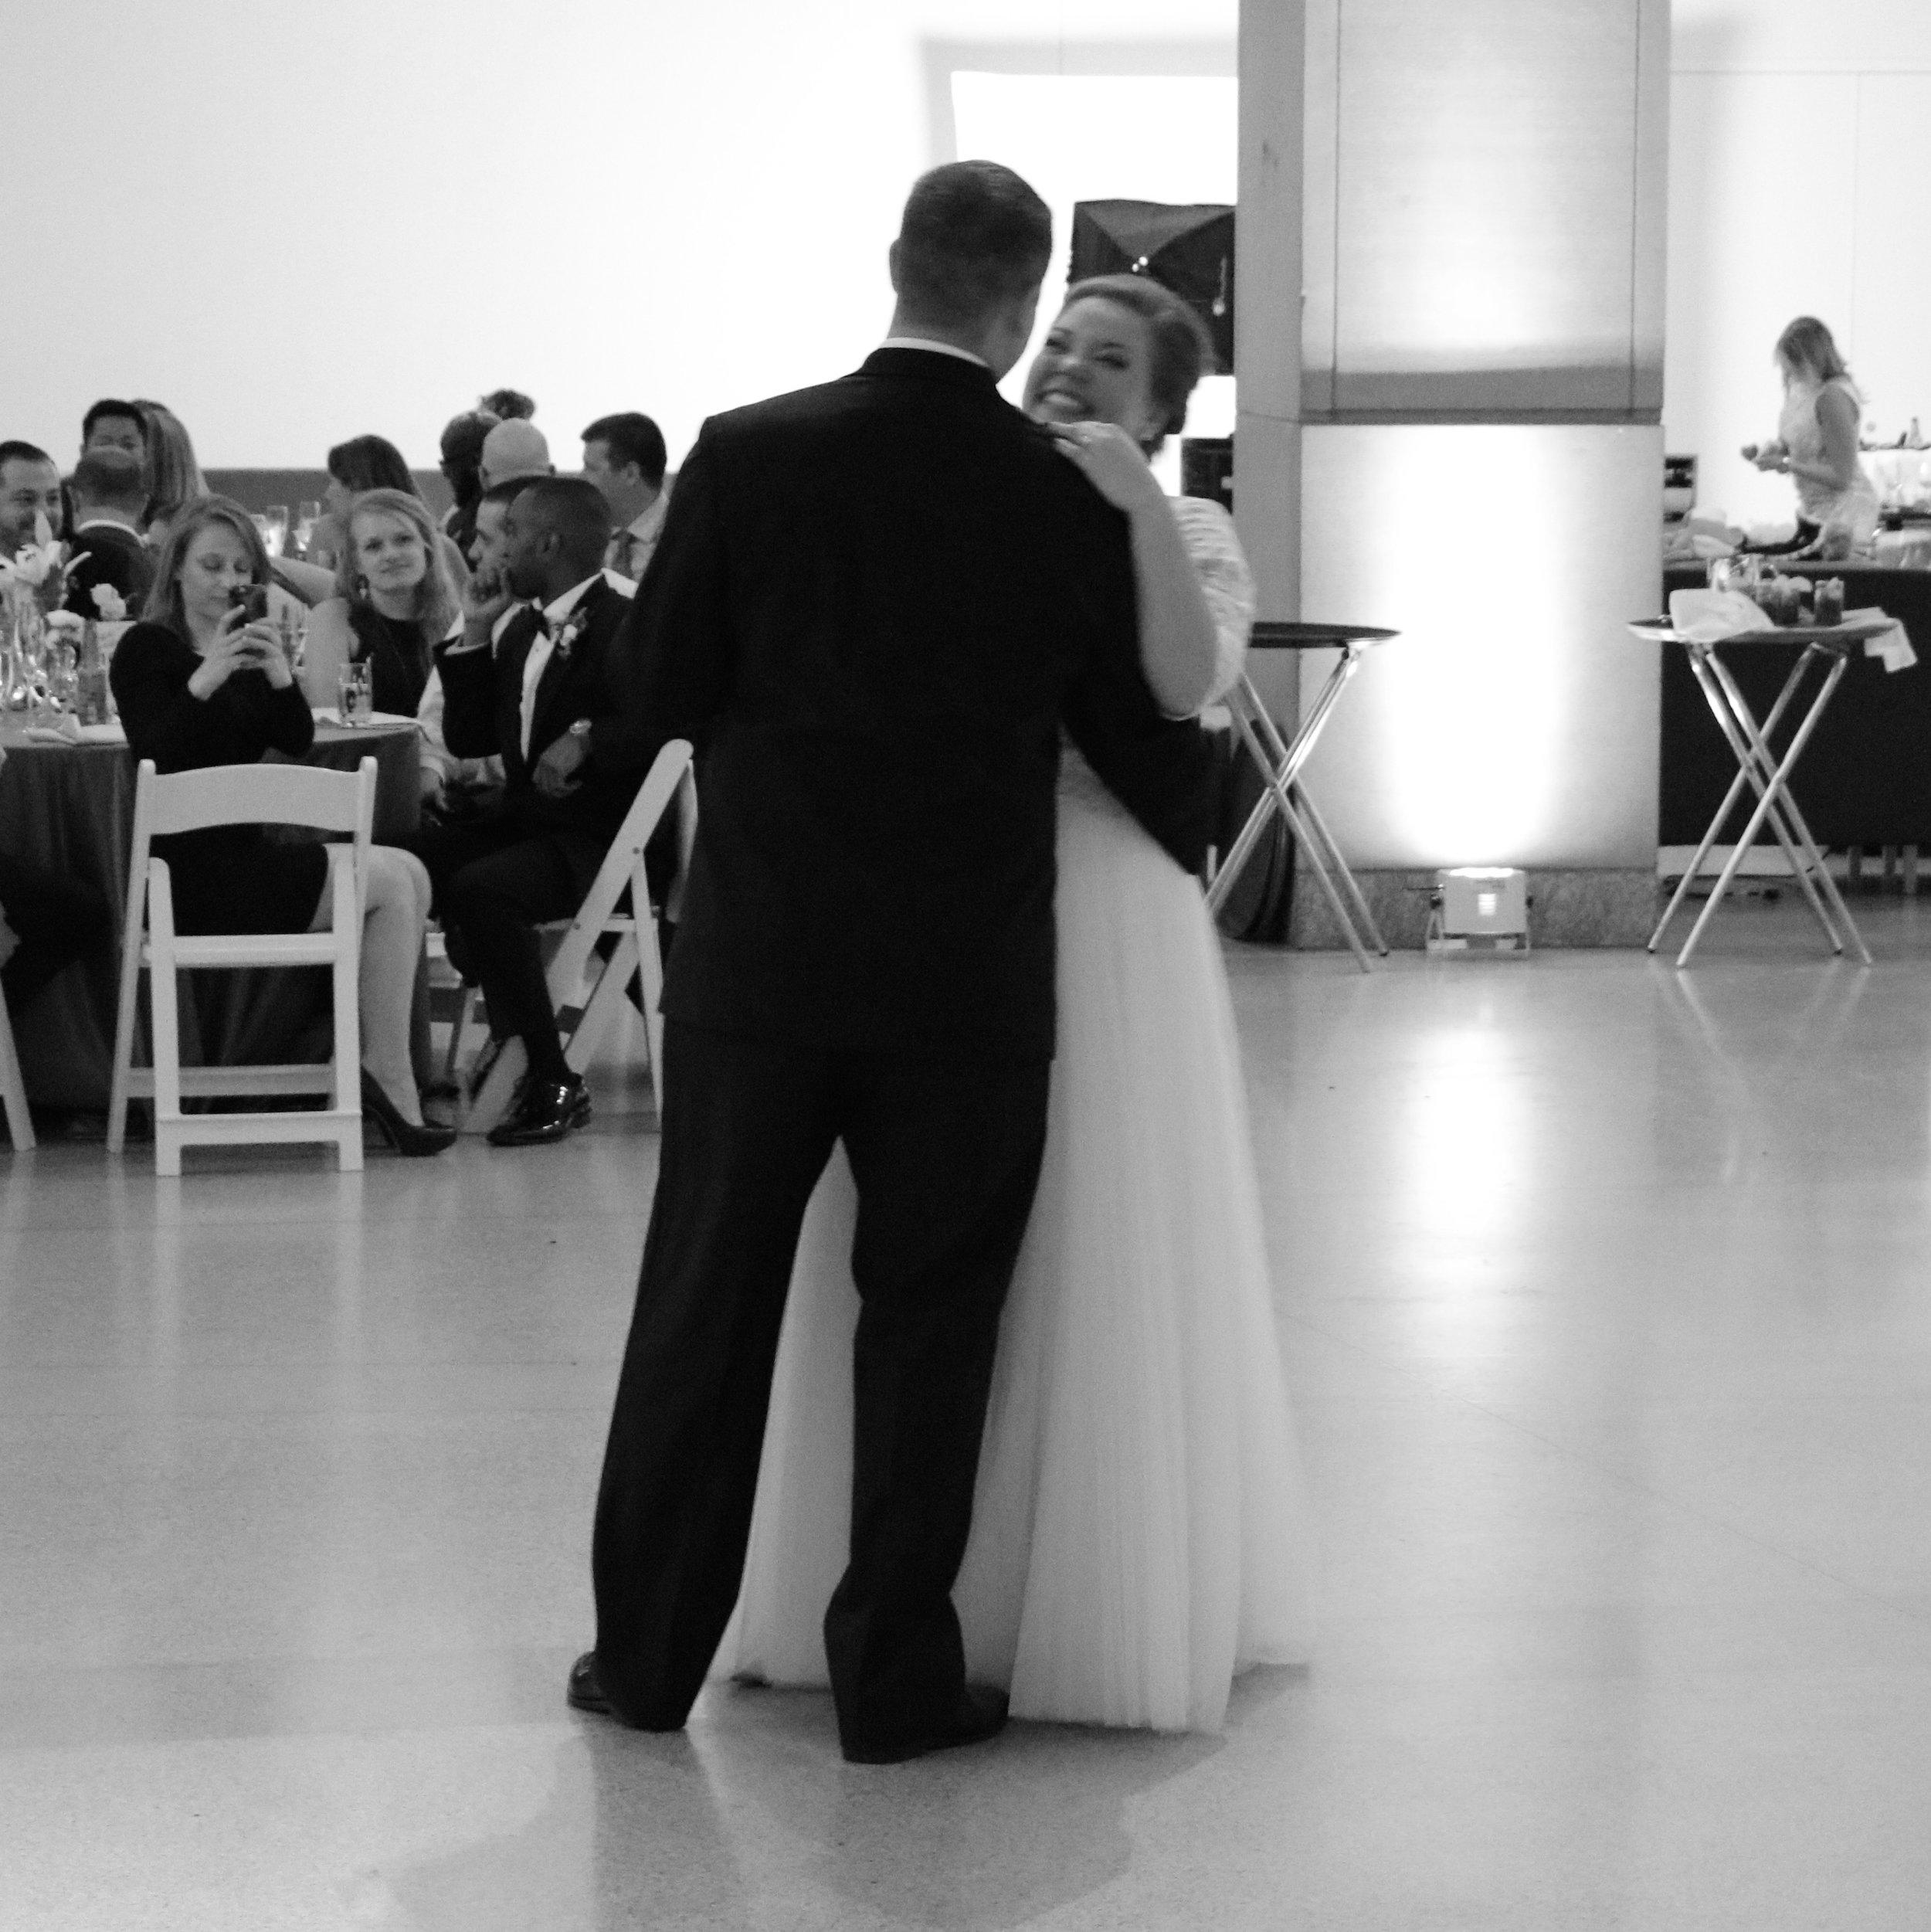 Kelsey & David's 1st dance: Everlasting Love